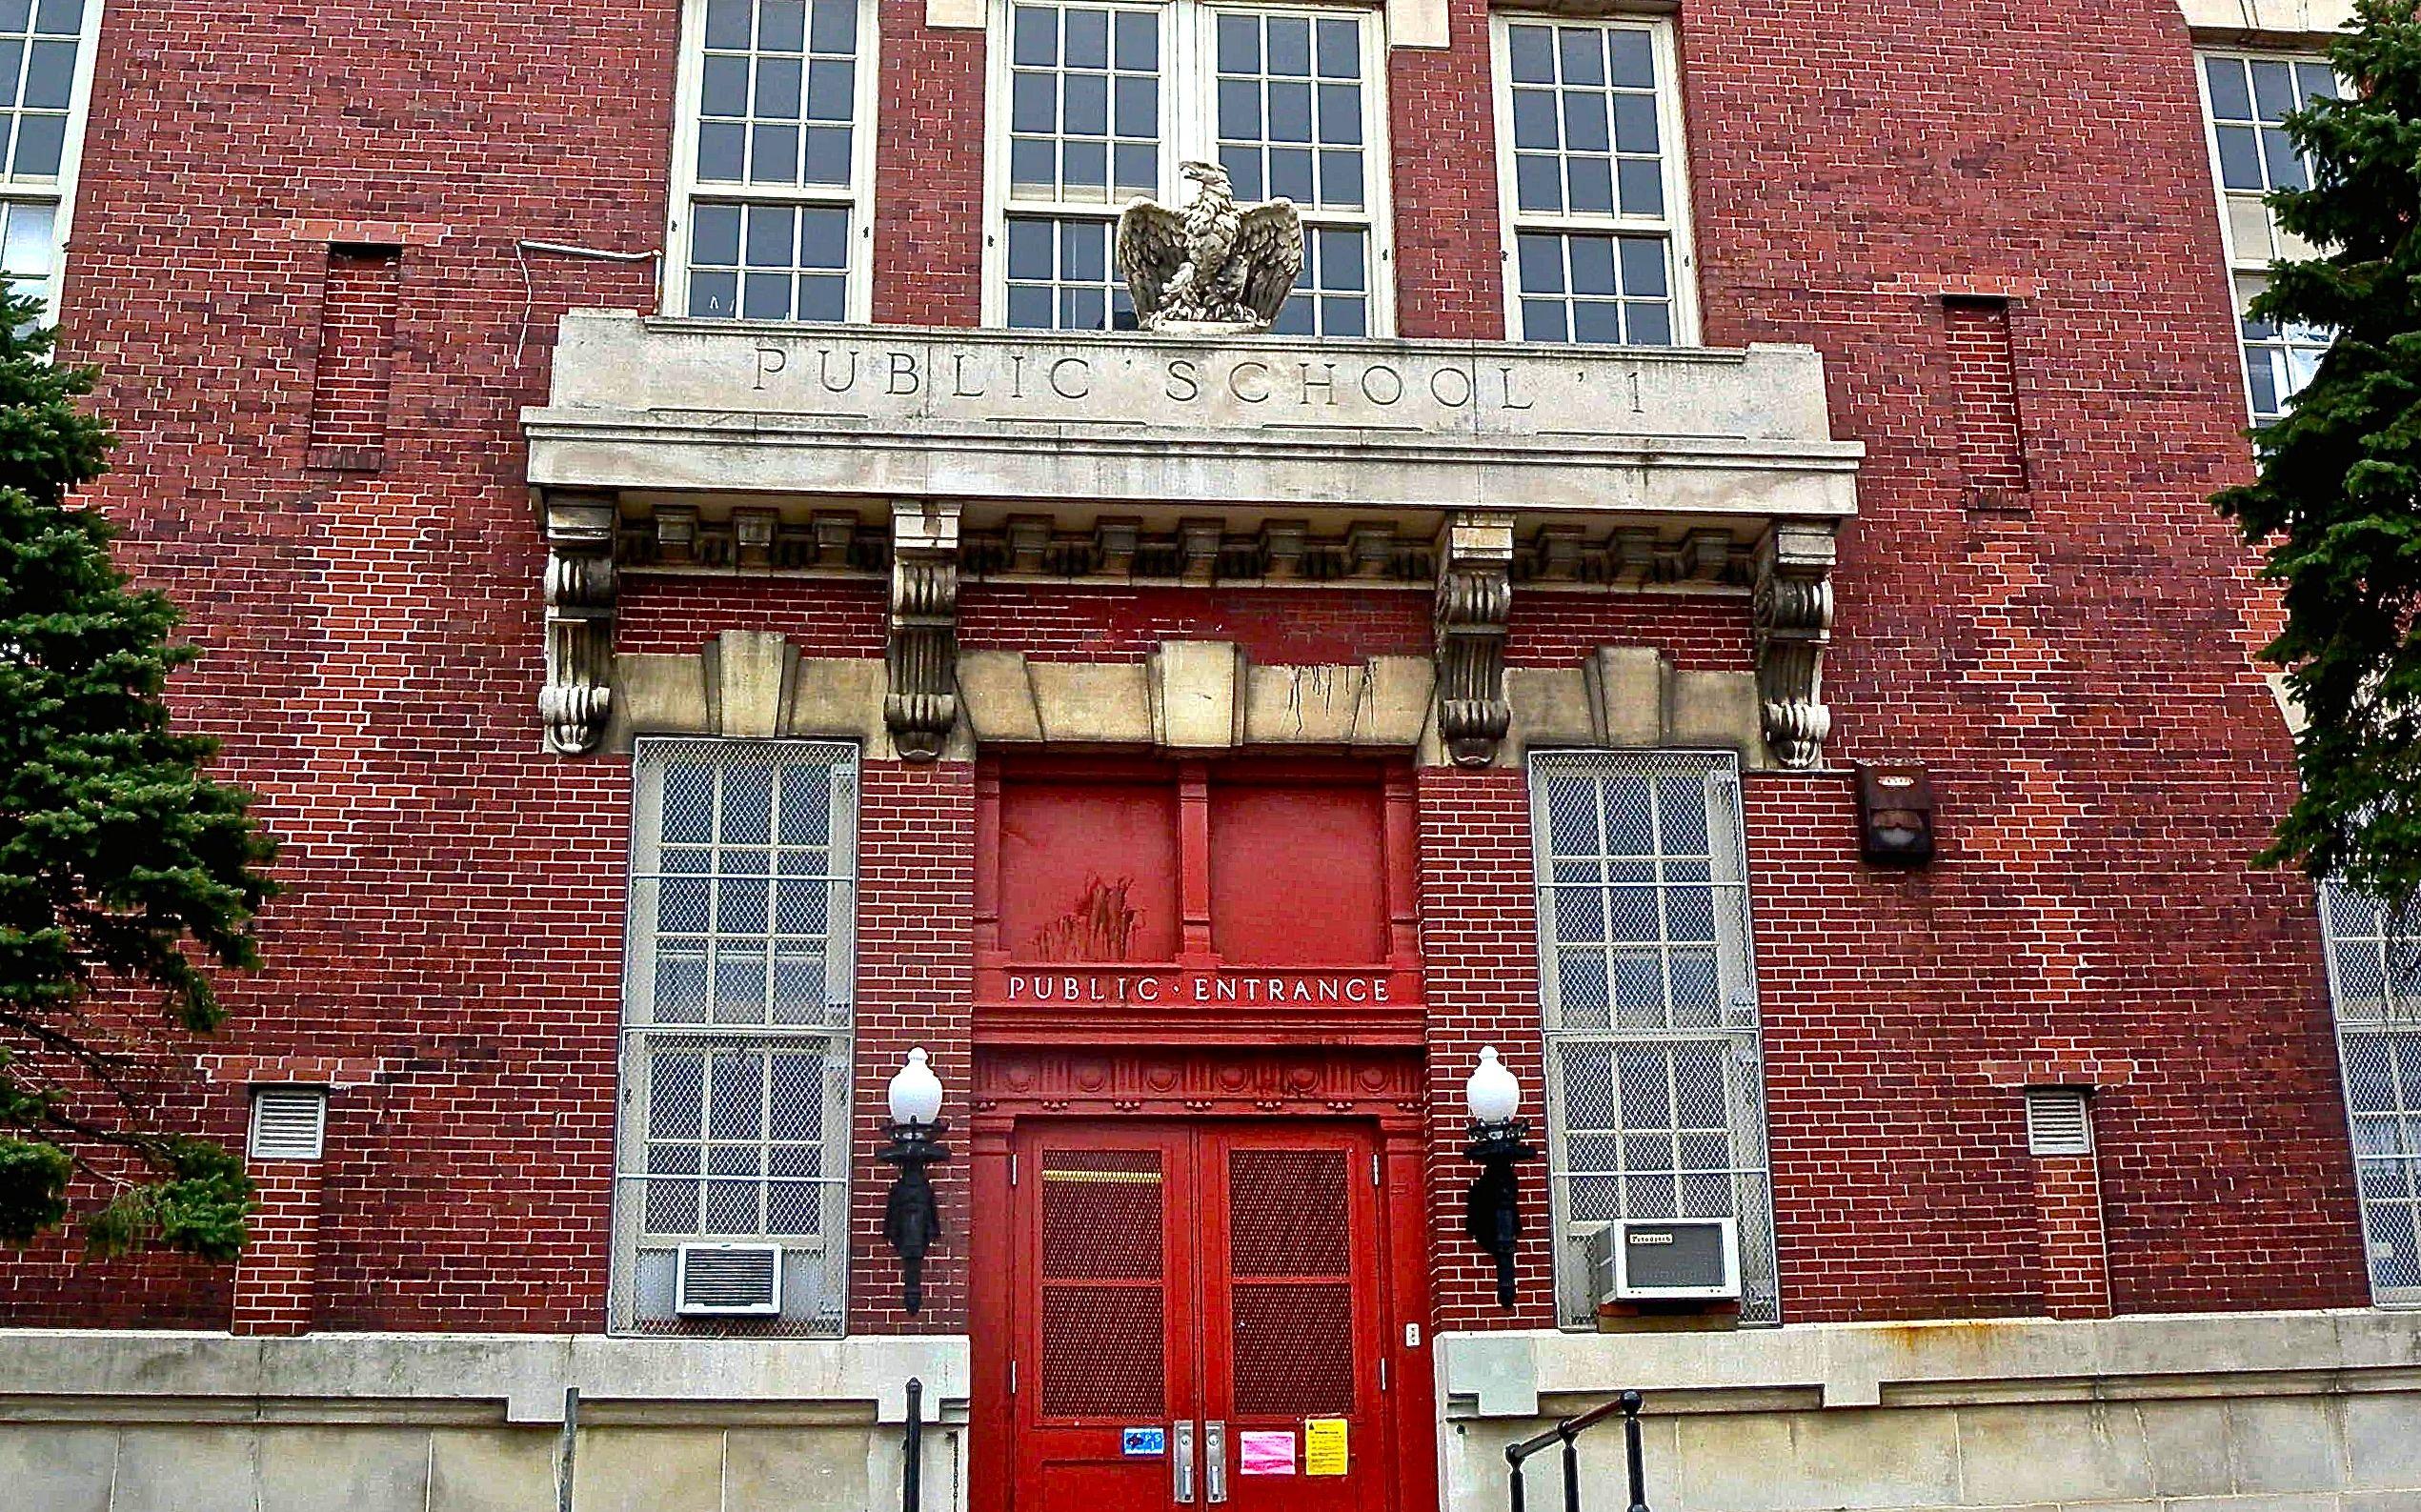 Public School 1 Staten Island Ny Staten Island Public School Public